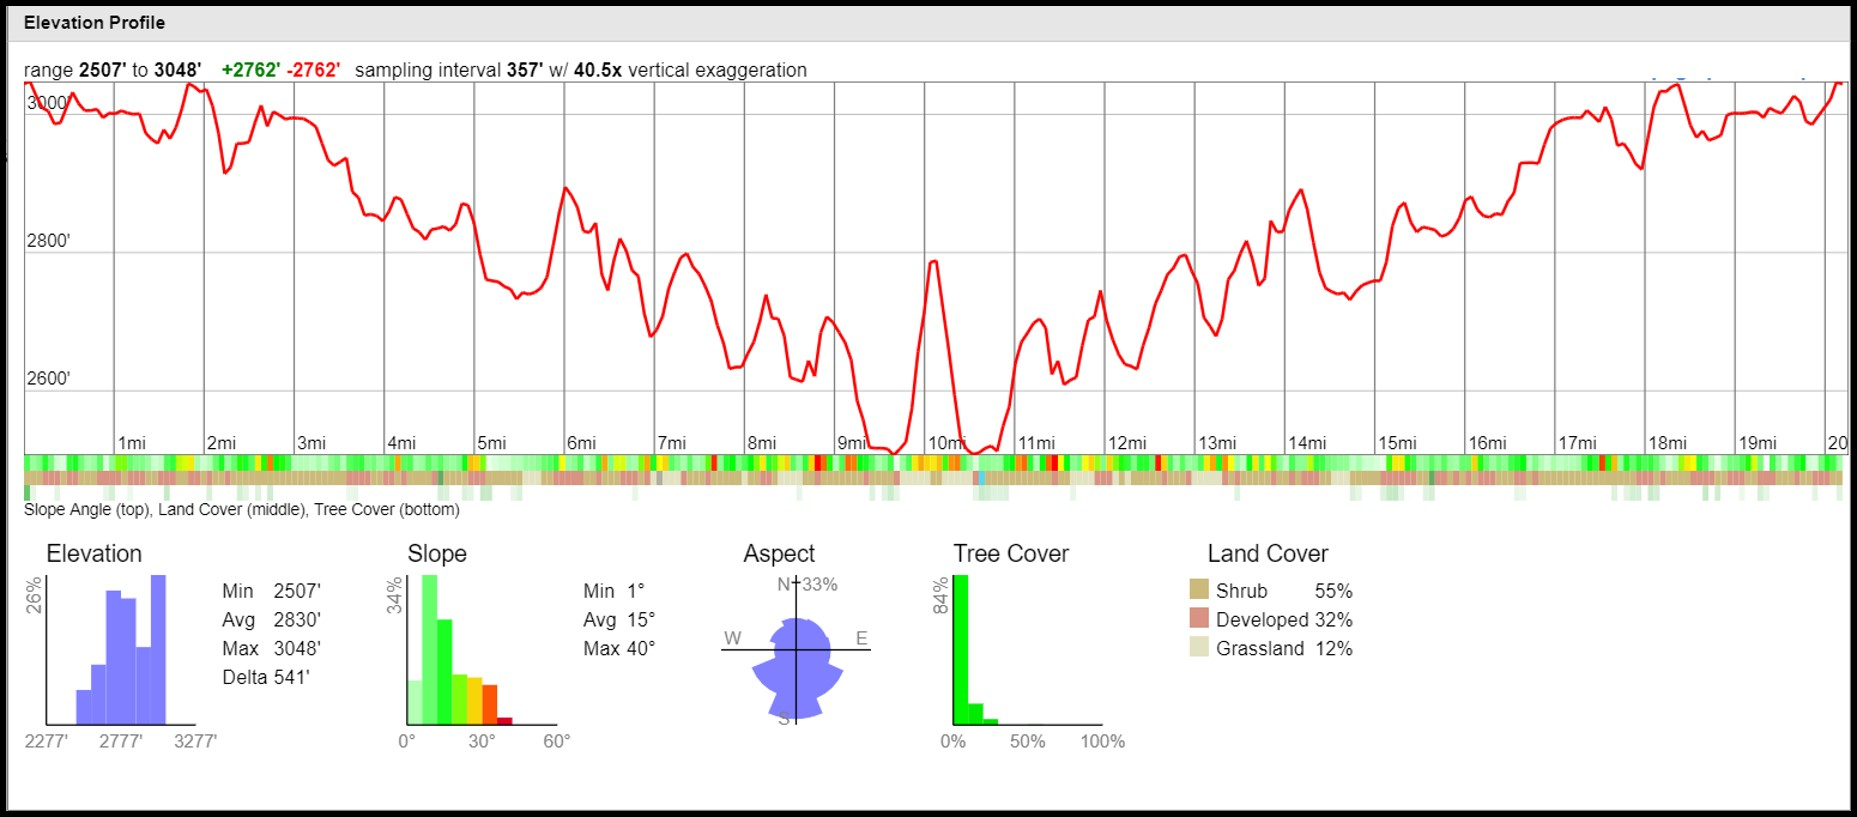 Willett Hot Springs Elevation Profile